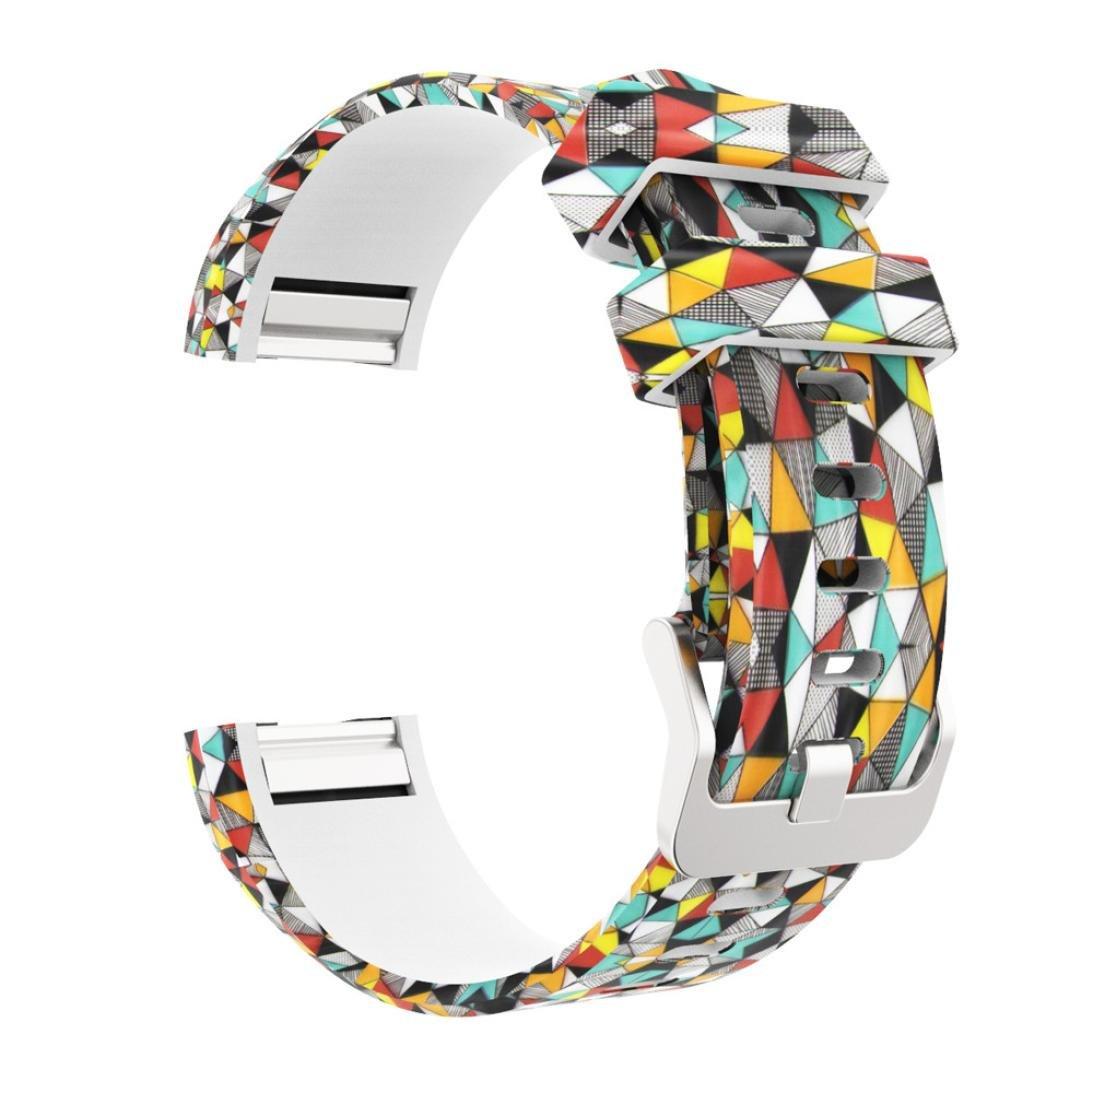 For C Fitbit For Charge 2、sukeqカラフルシリコンスポーツ交換用リストバンド調整可能フローラルプリントスマートウォッチバンドストラップ B078N785KD C B078N785KD, HAYARU:5f51043a --- arvoreazul.com.br